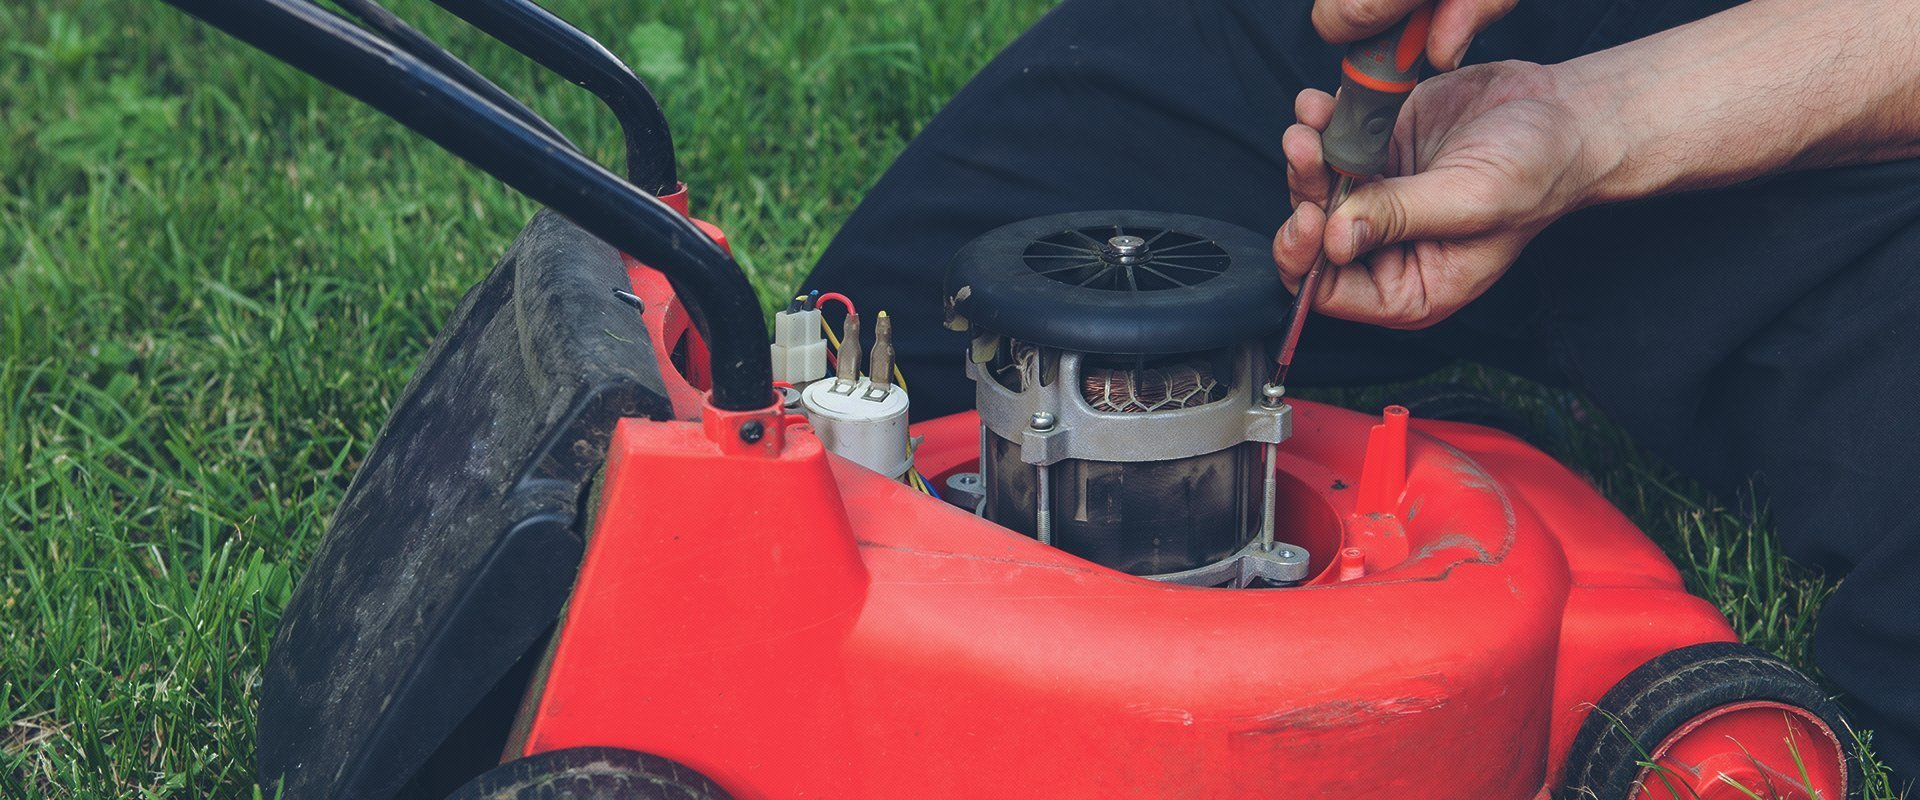 Lawnmower repairs